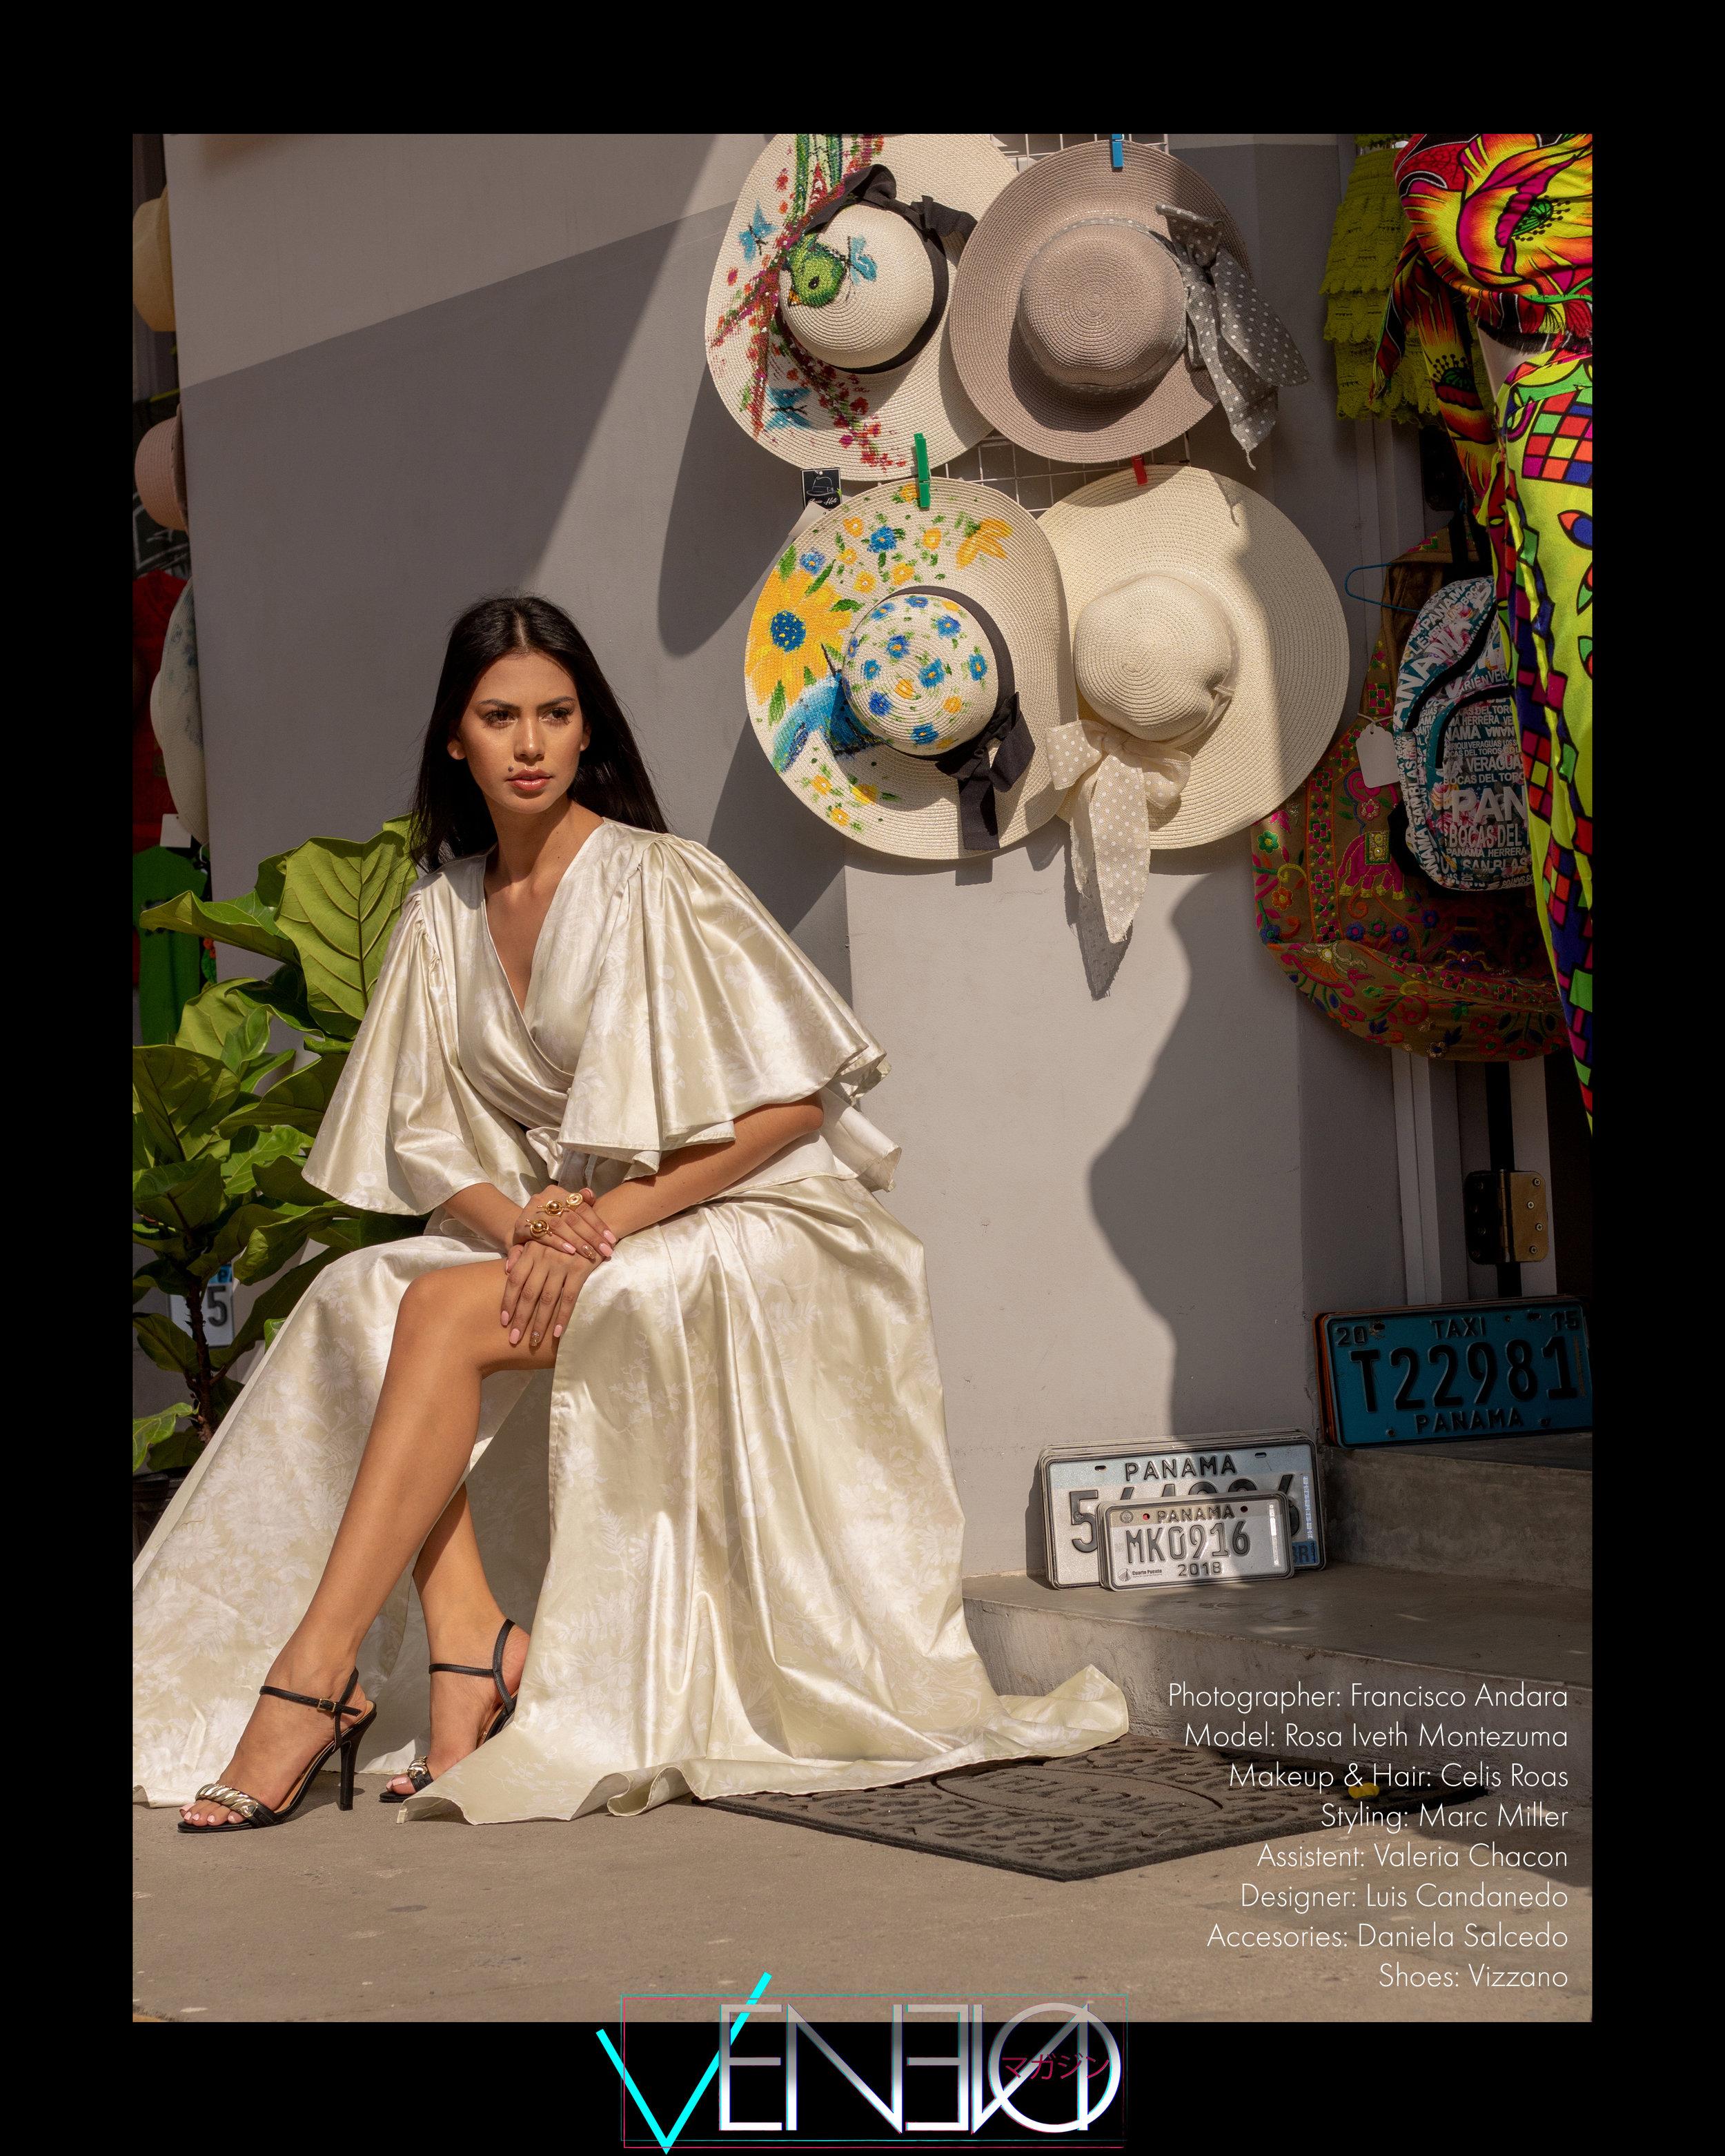 Dress: Luis Candanedo  @luis_candanedo  Accessories: Daniela Salcedo  @ds_danielasalcedo  Shoes: Vizzano  @vizzano_oficial